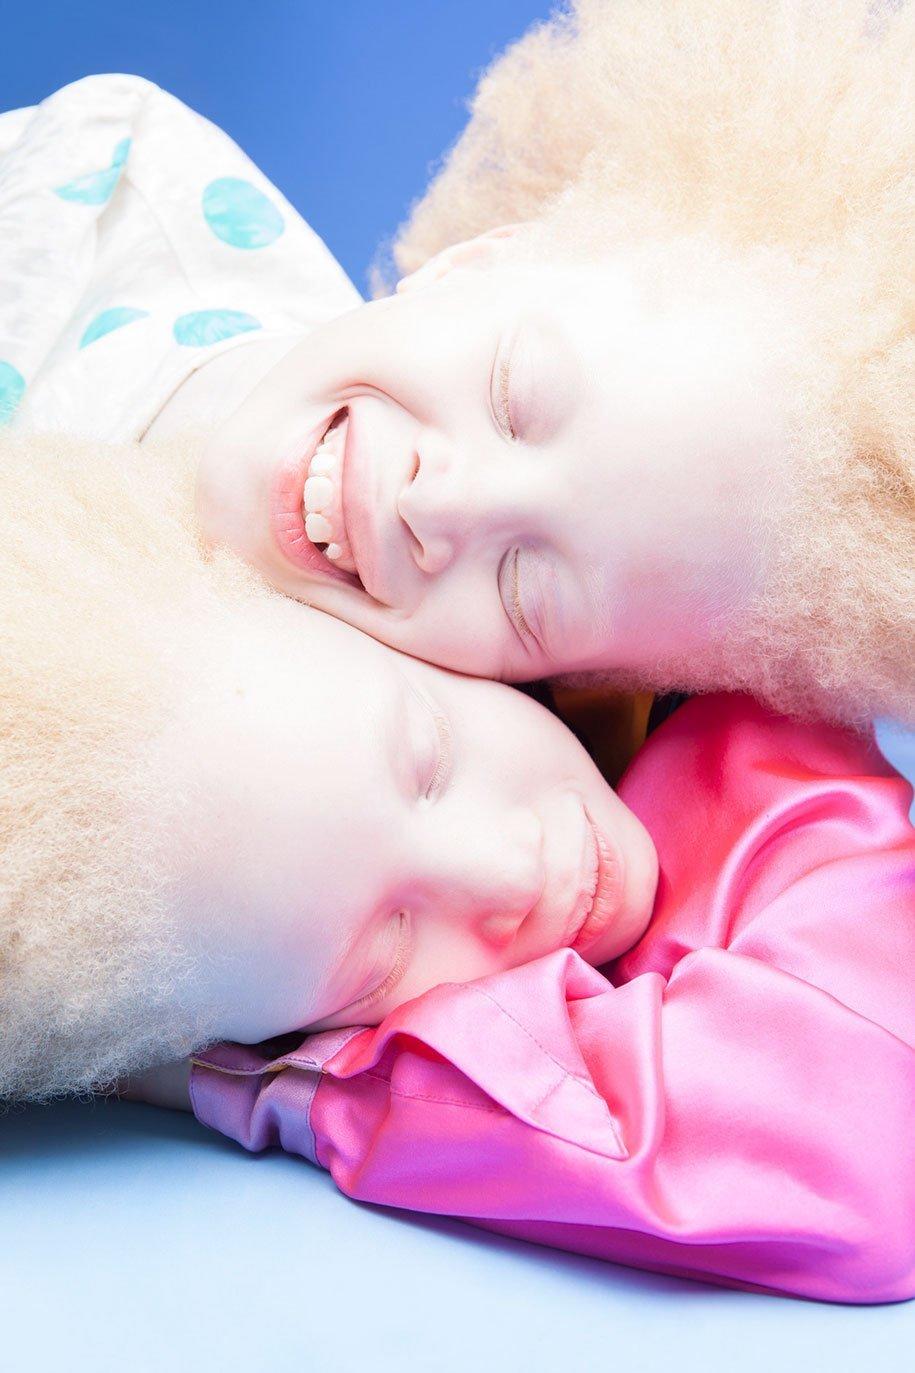 albino-twins-models-bawar-3